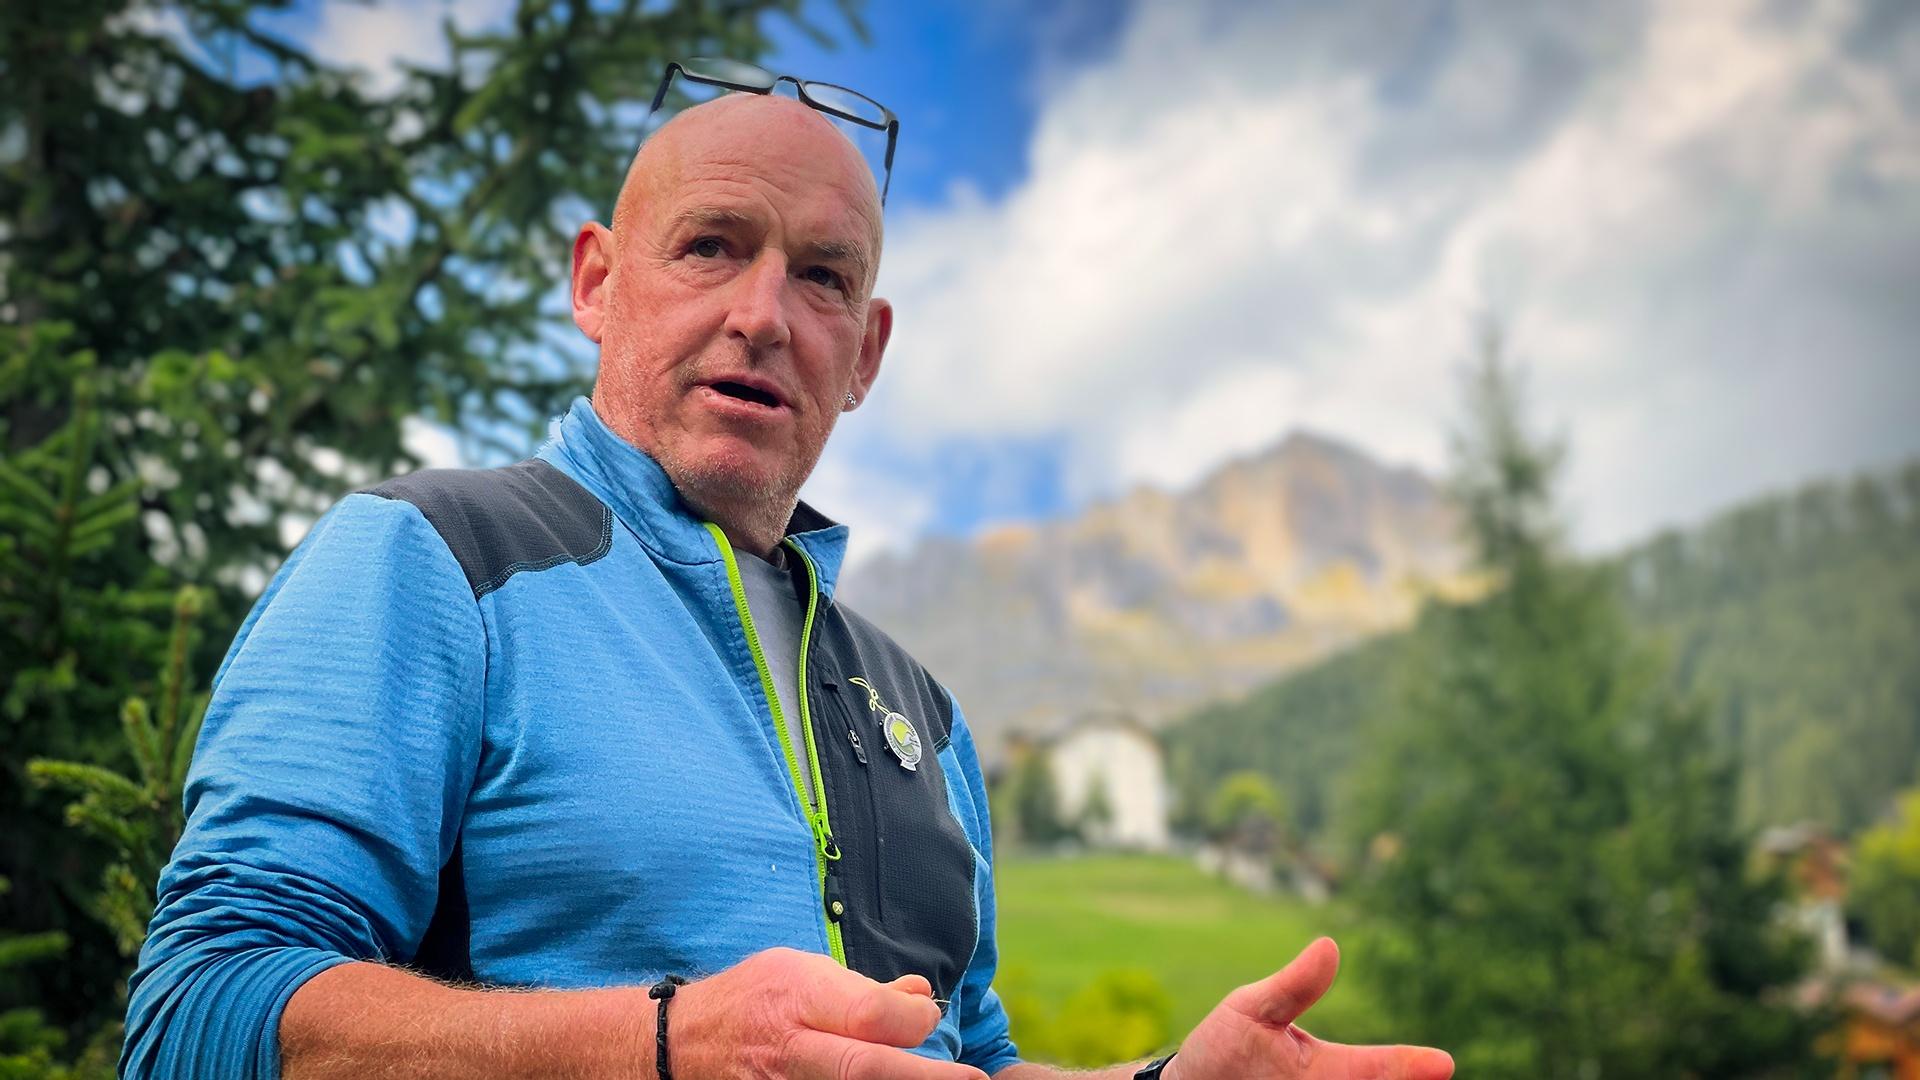 Christof Alfreider, Ideator Bergsteigerdorf Lungiarü I ©Ingo Ortner, Bergsteigerdorf Mauthen I Bergsteigerdörfer